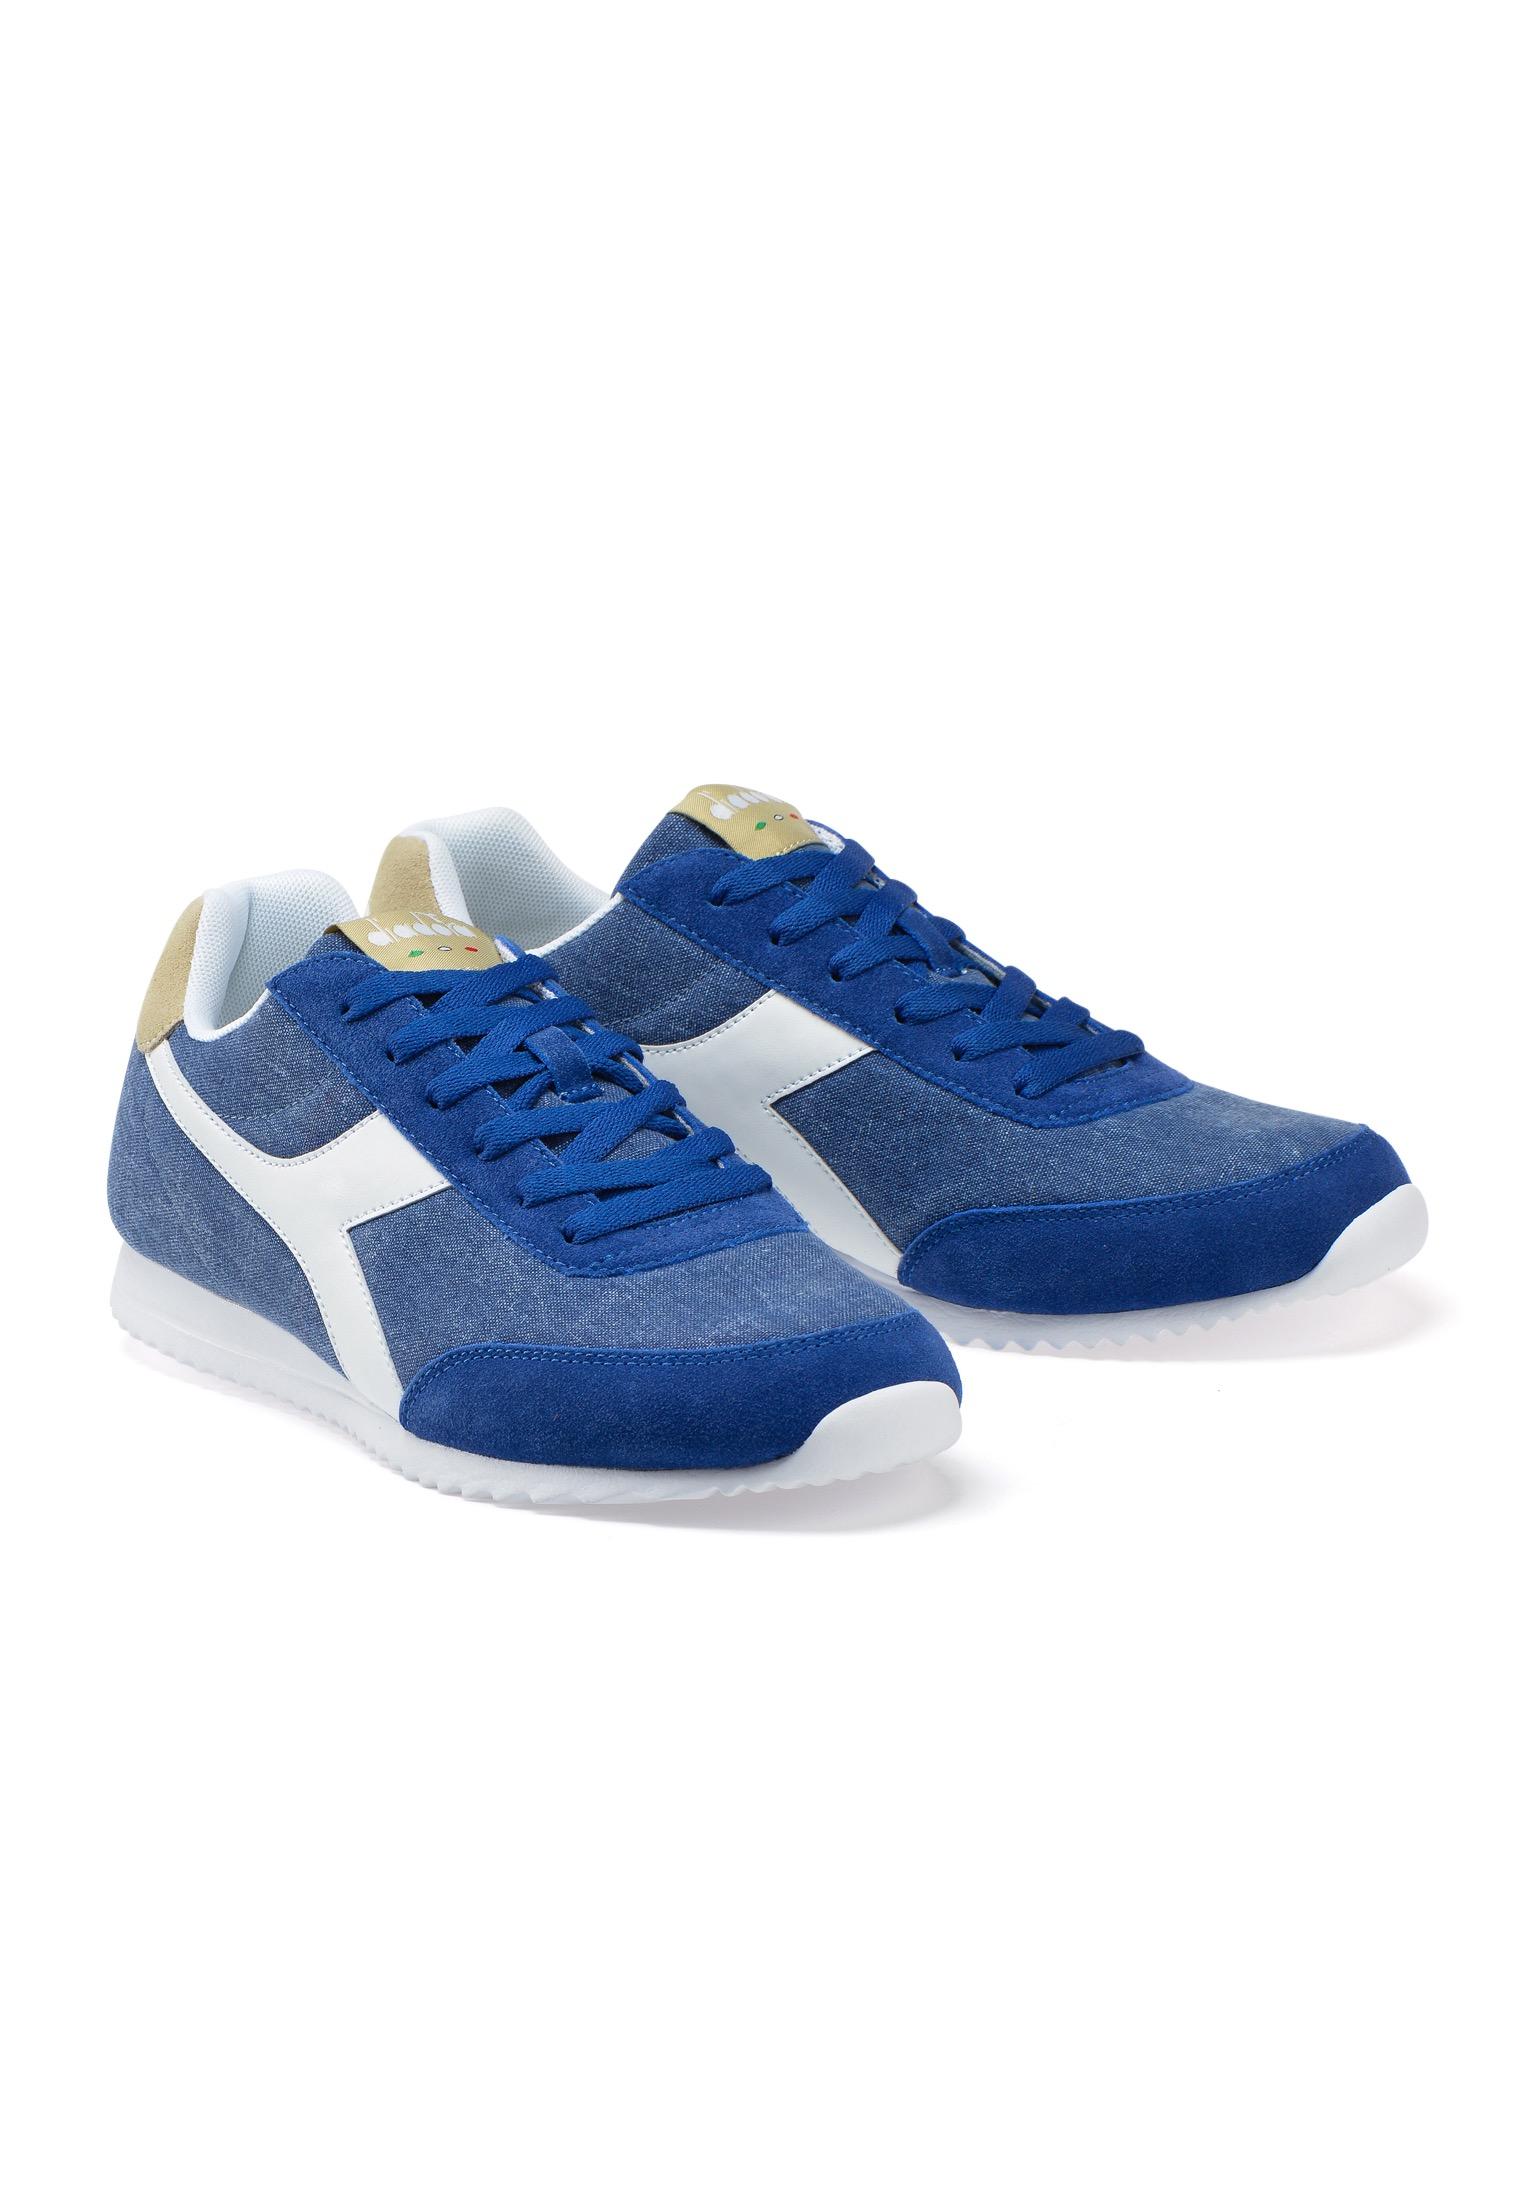 Scarpe-Diadora-Jog-Light-C-Sneakers-sportive-uomo-donna-vari-colori-e-taglie miniatura 18